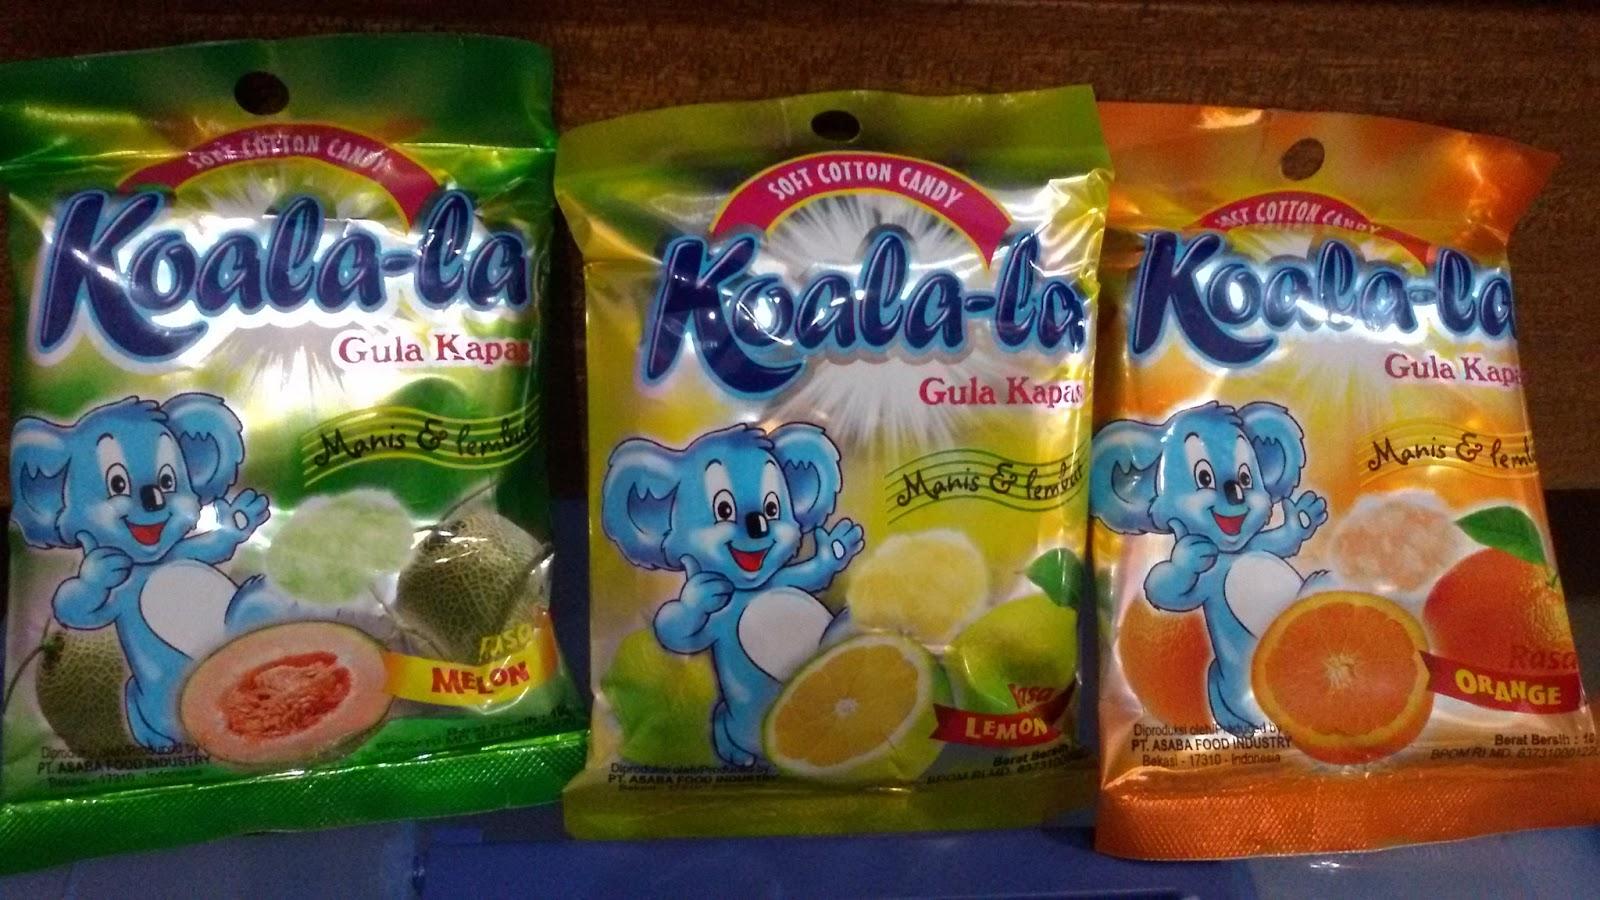 Gula kapas (tokopedia.com)